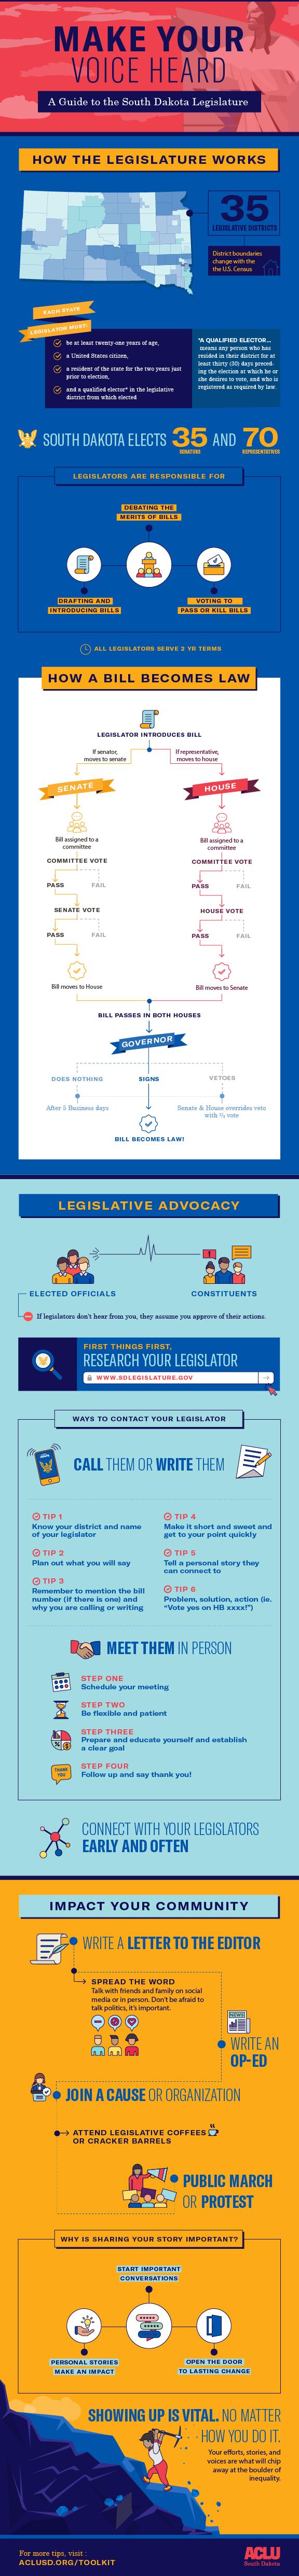 type-aclu-sd_citizen-lobbying_11-16-18.png